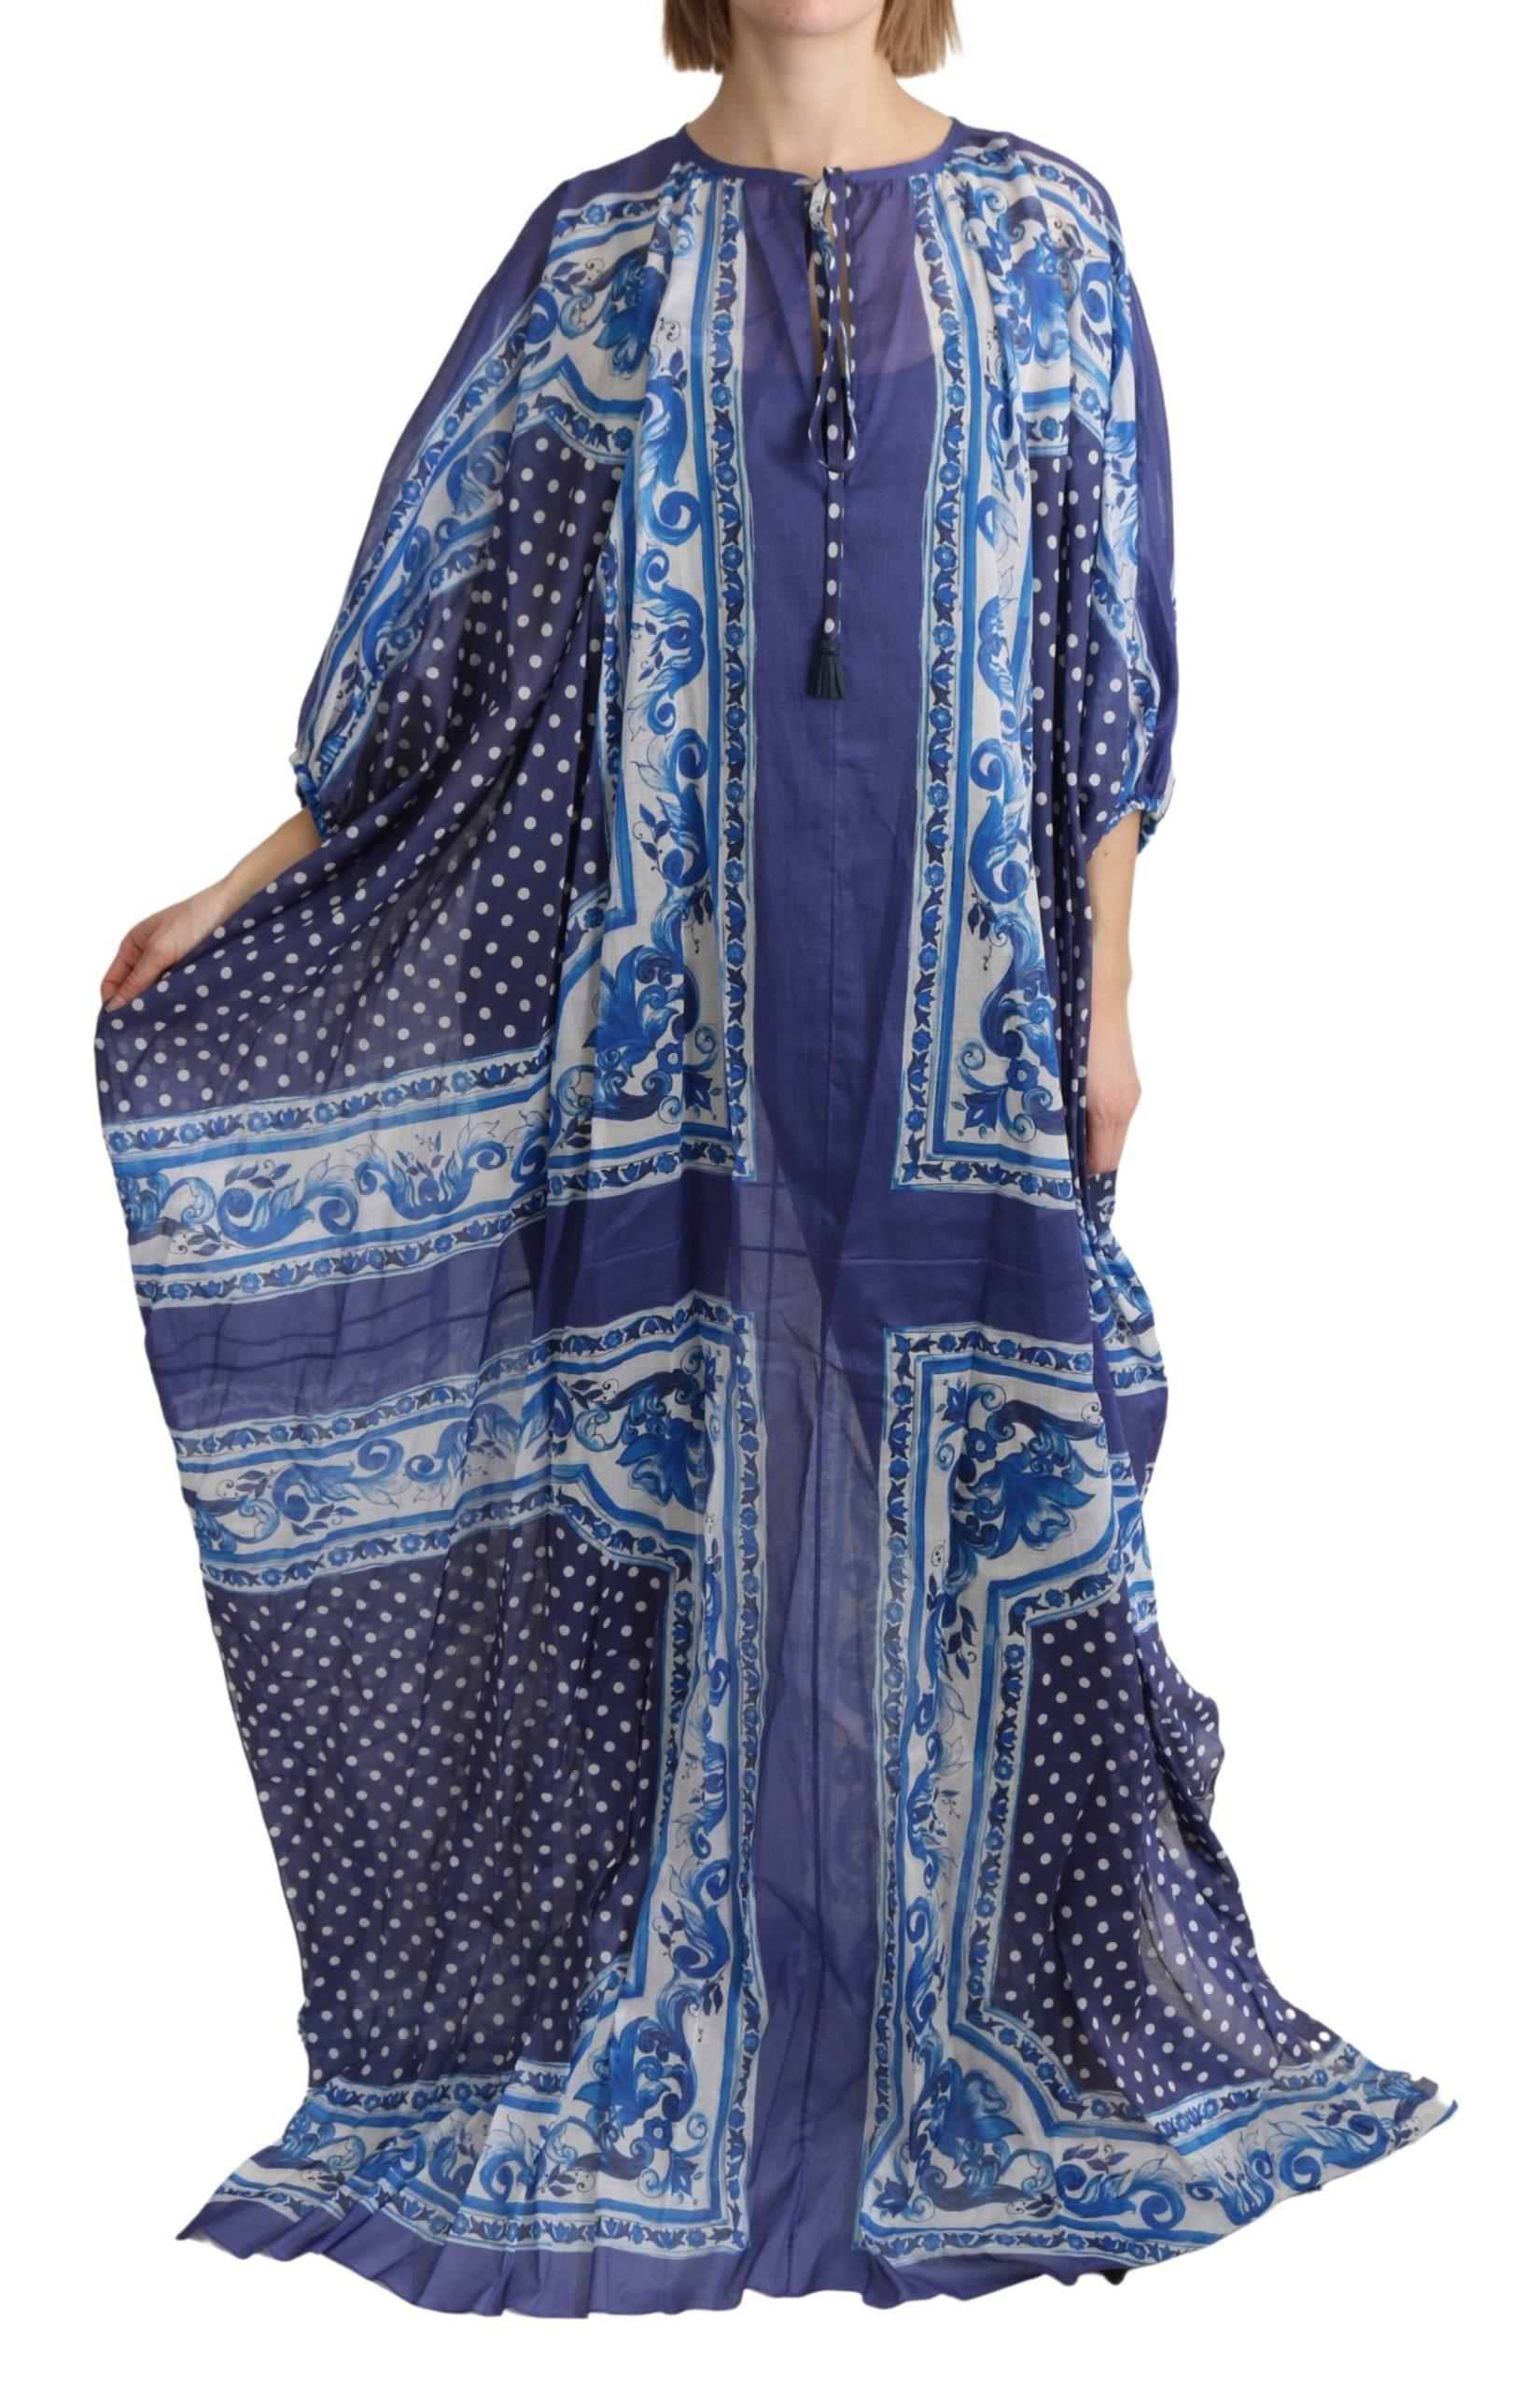 Dolce & Gabbana Women's Majolica Cape Cotton Dress Blue DR2602 - IT44 L